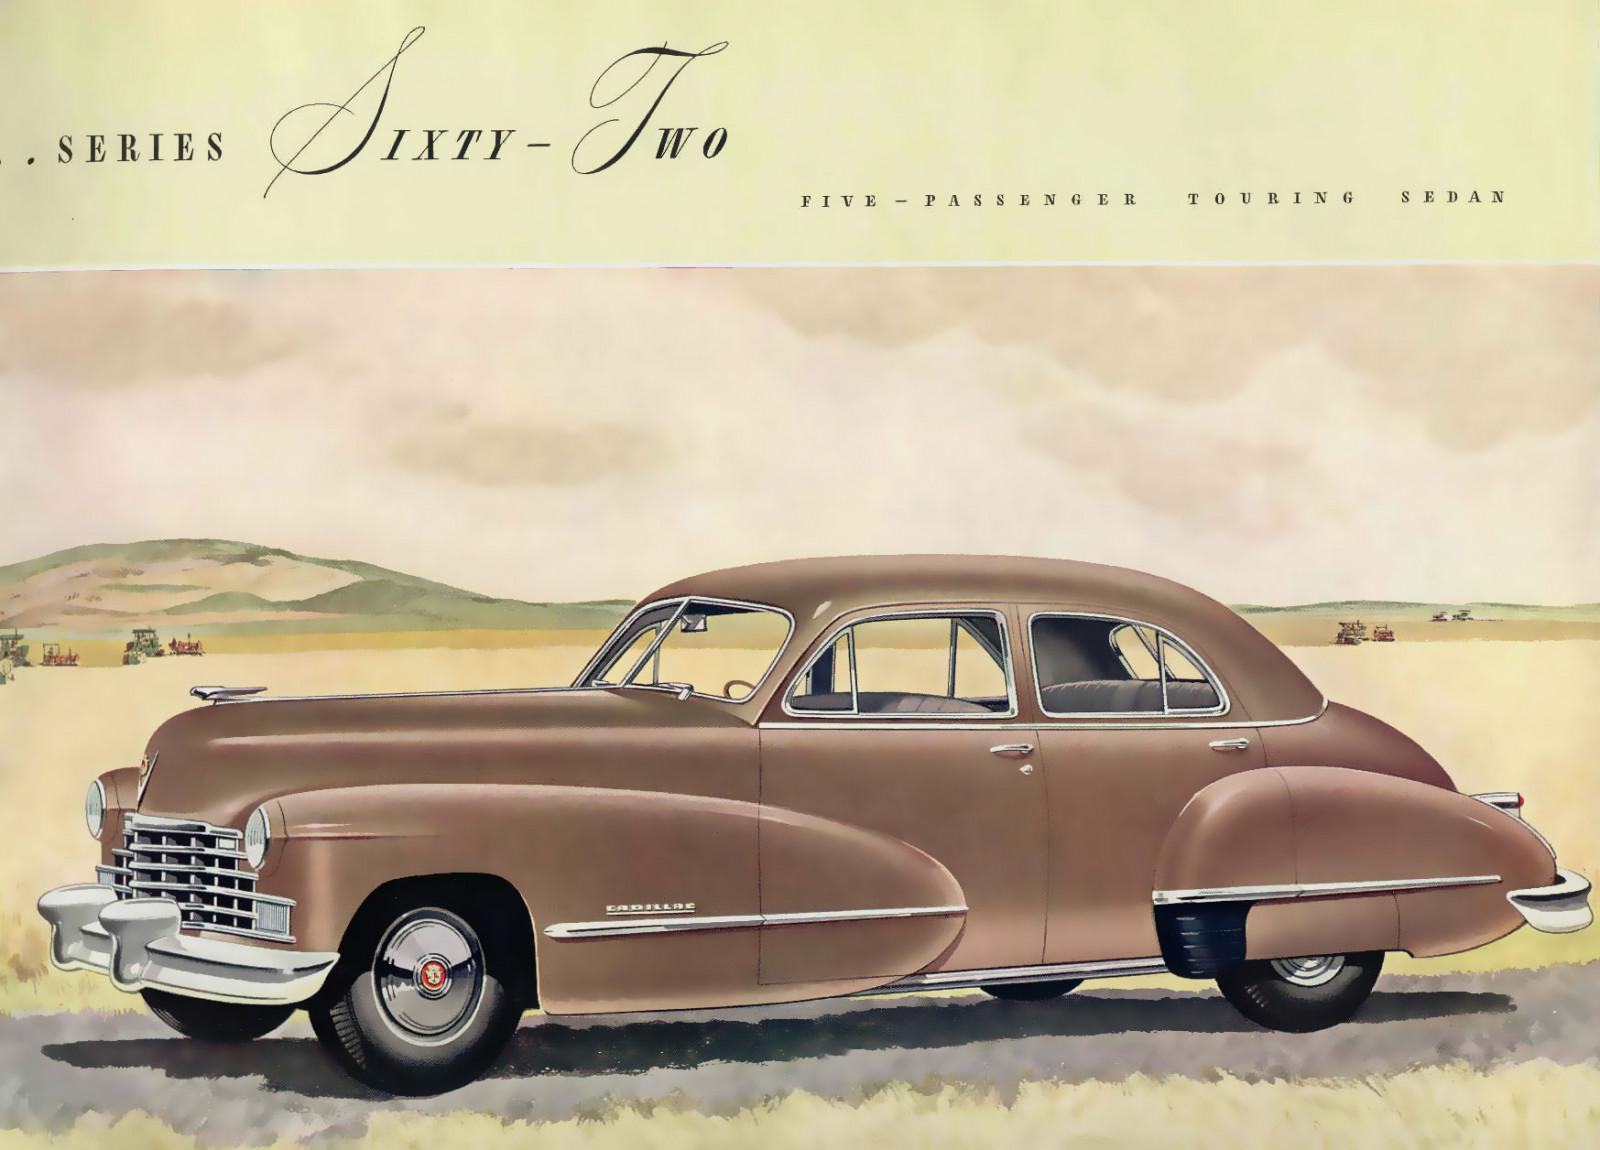 Wallpaper : Buick, vintage, wheels, brand, Vintage car, classic ...